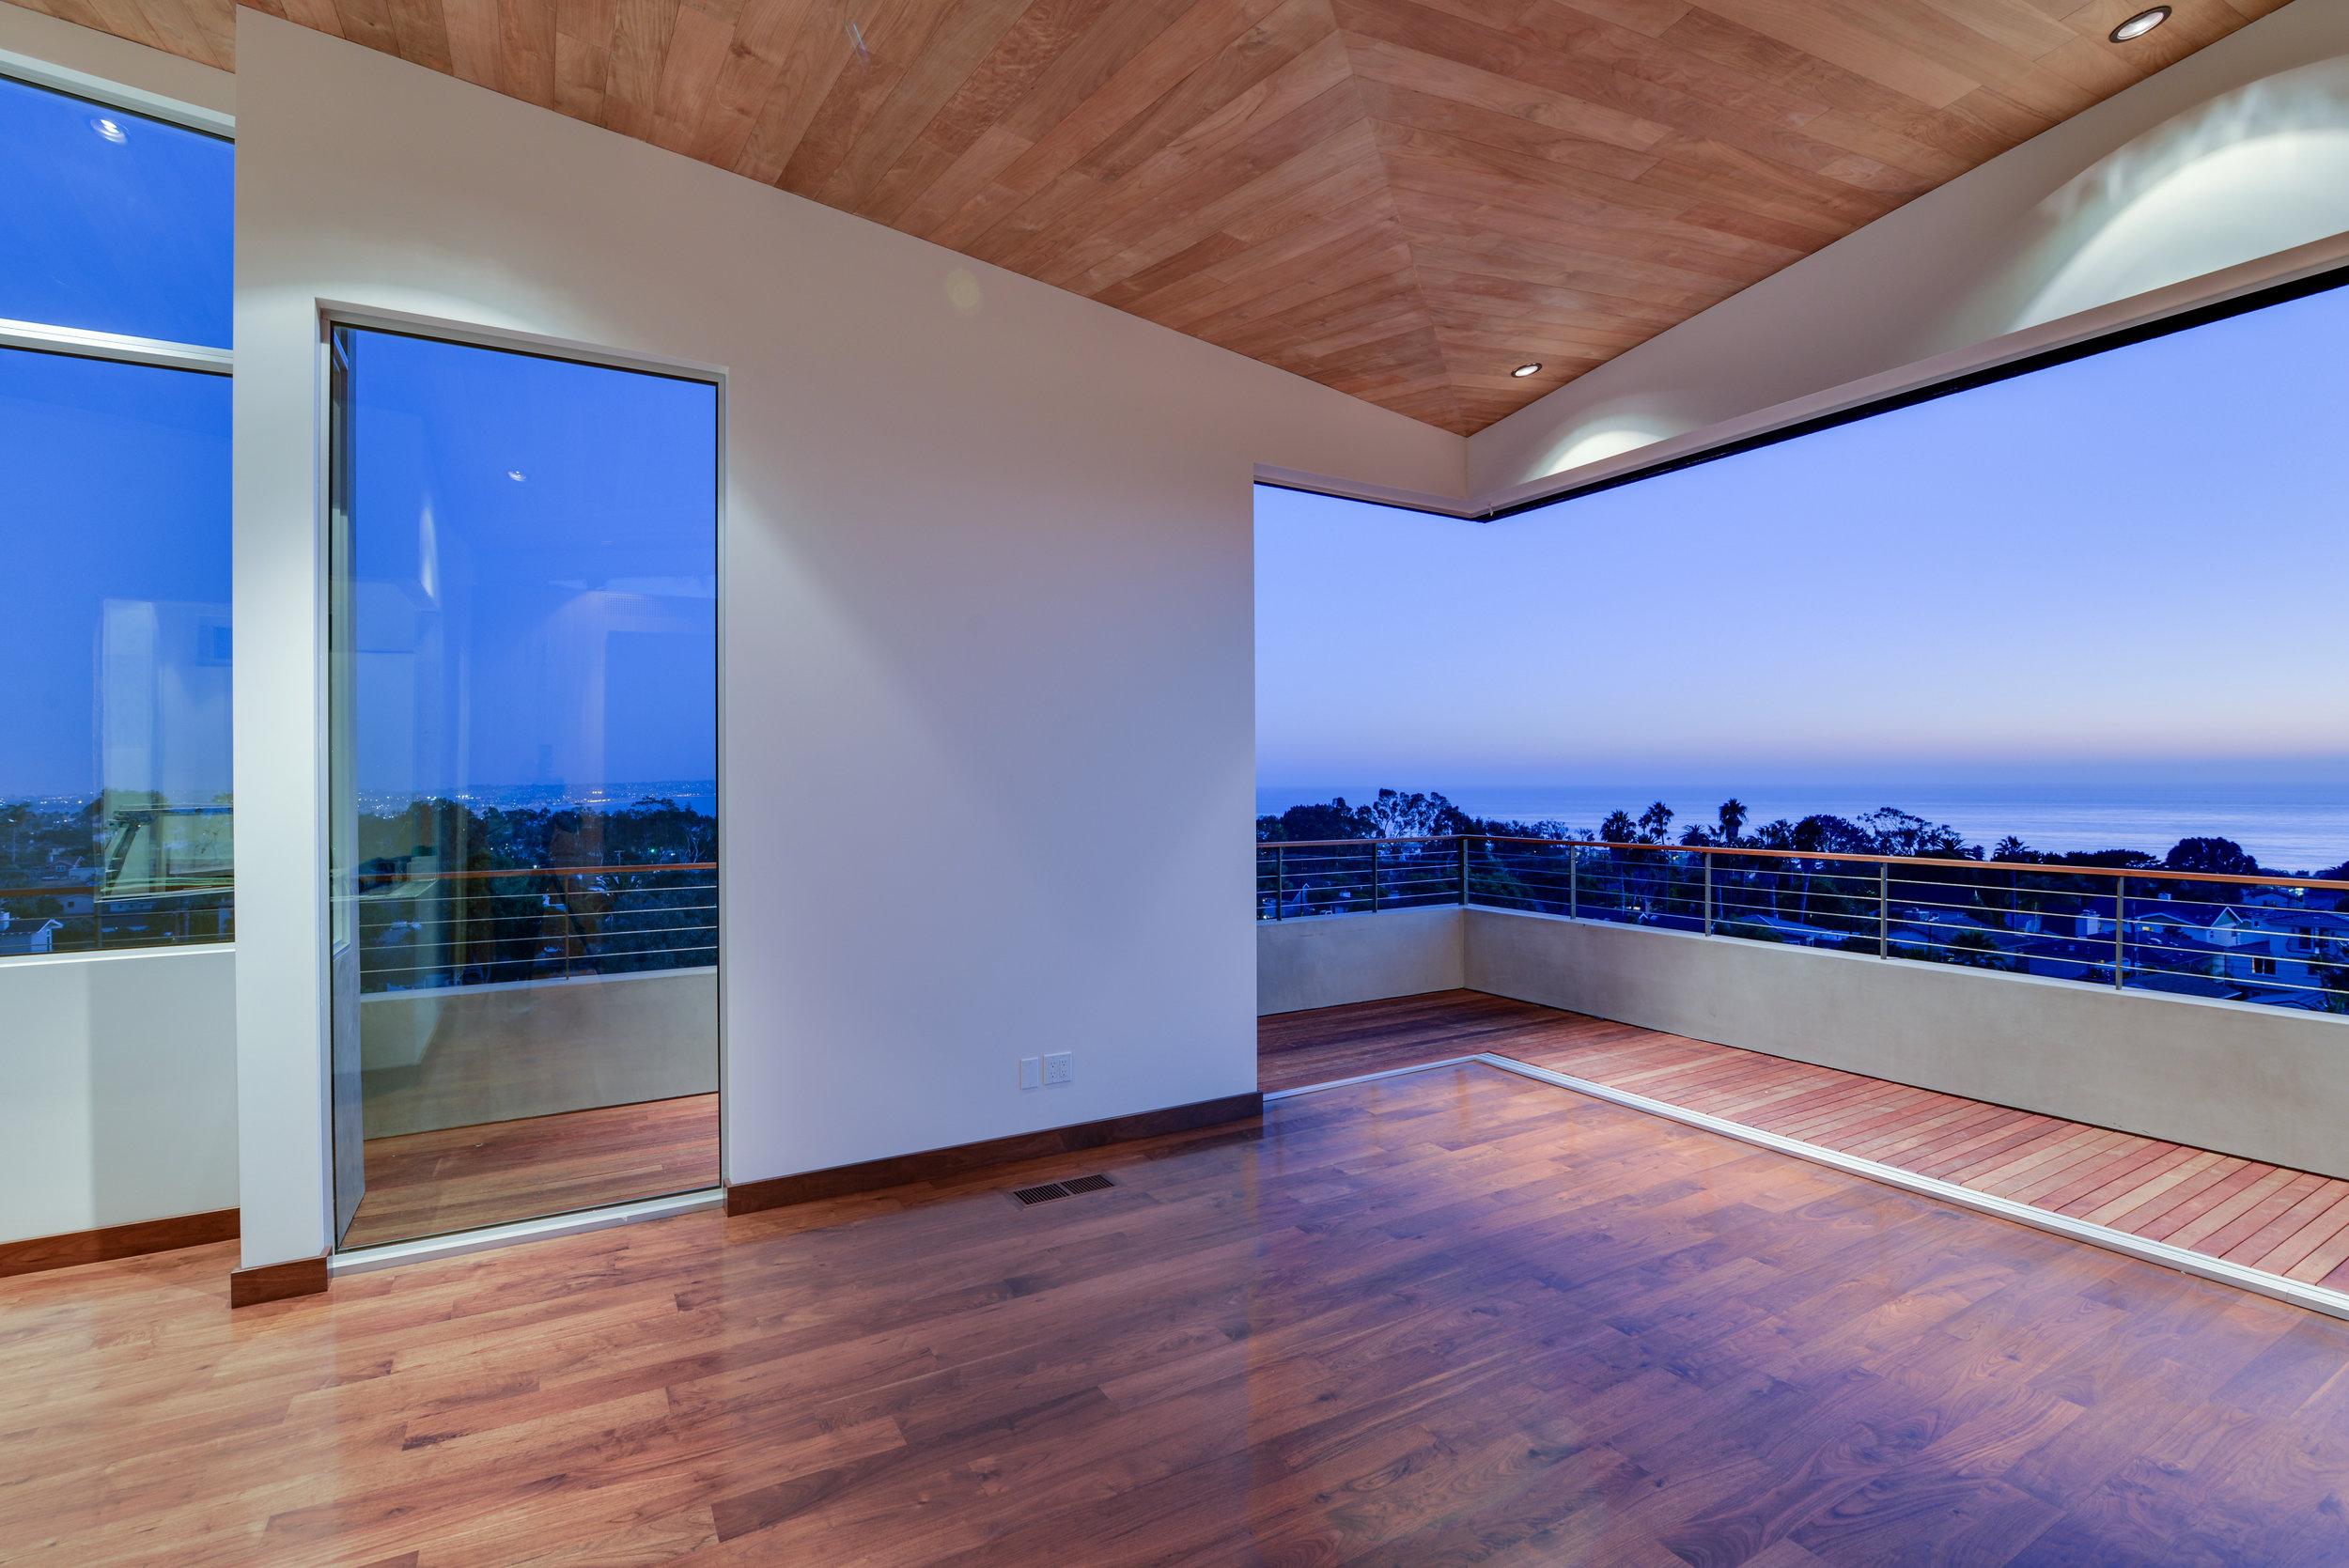 S.E.A.-Studio-Environmental-Architecture-David-Hertz-FAIA-Linda-Rosa-House-La-Jolla-San-Diego-sustainable-regenerative-restorative-design-modern-residential-mindful-garden-panoramic-ocean-view-open-concept-california-dream-17.jpg